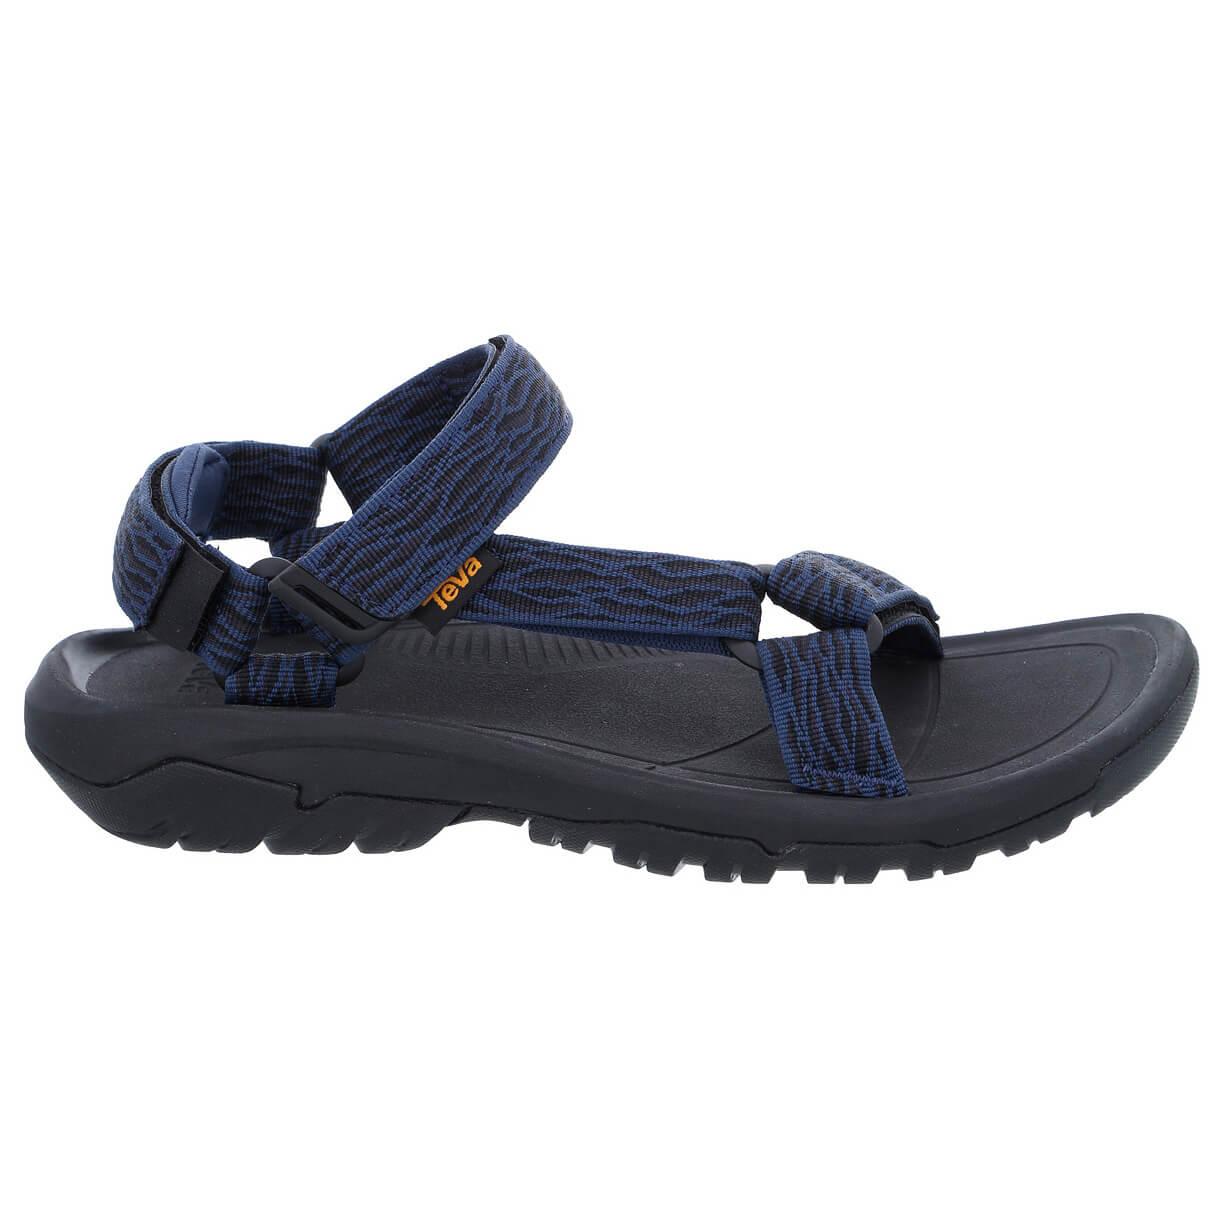 Teva Kids Shoes